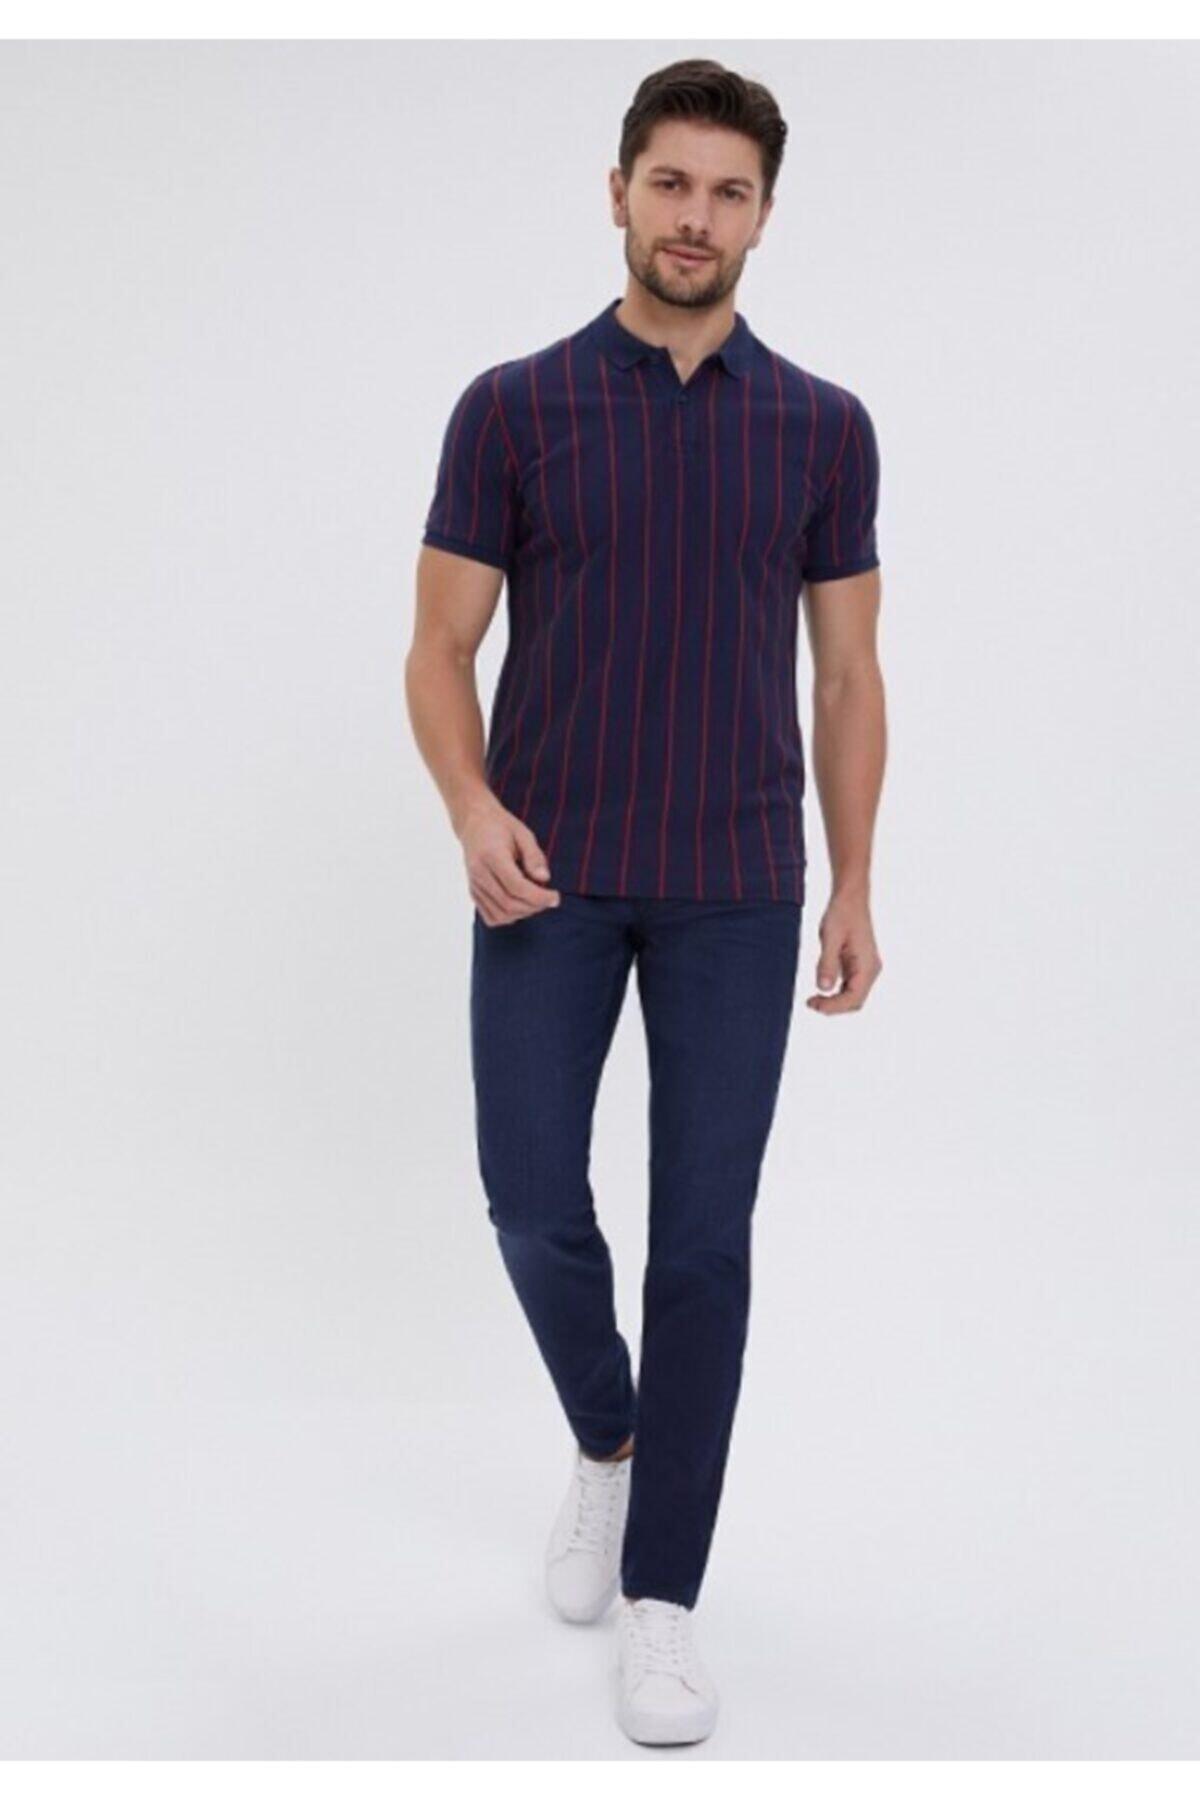 شلوار جین مردانه برند Loft رنگ لاجوردی کد ty46254904